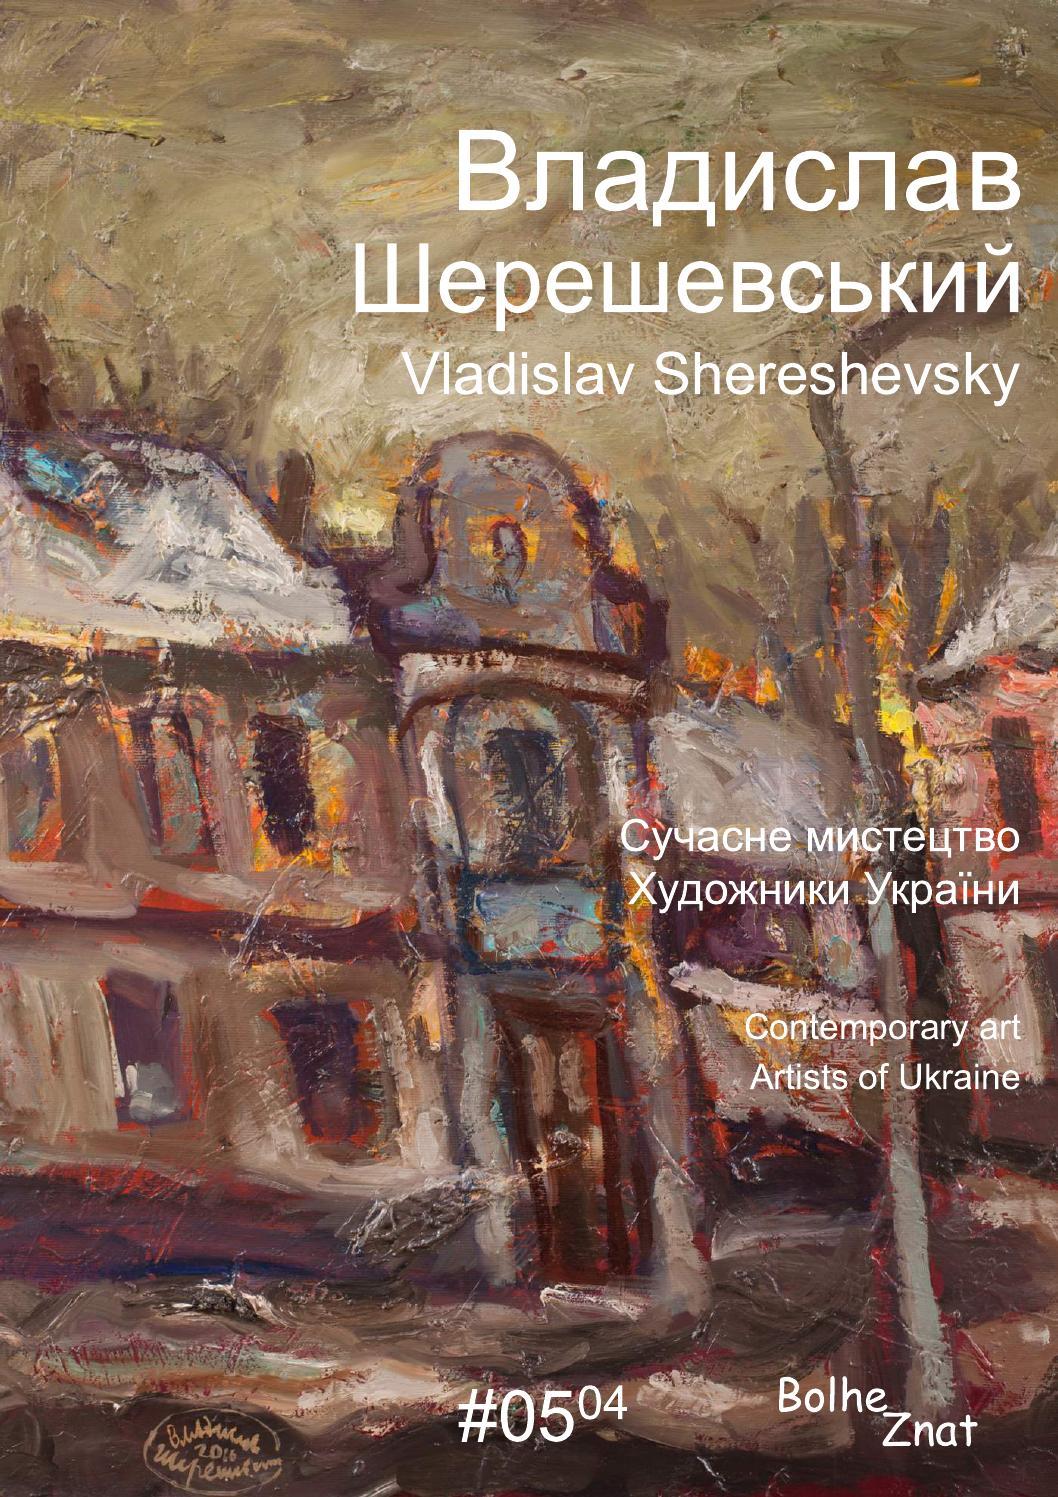 Владислав Шерешевський. Vladislav Shereshevsky.